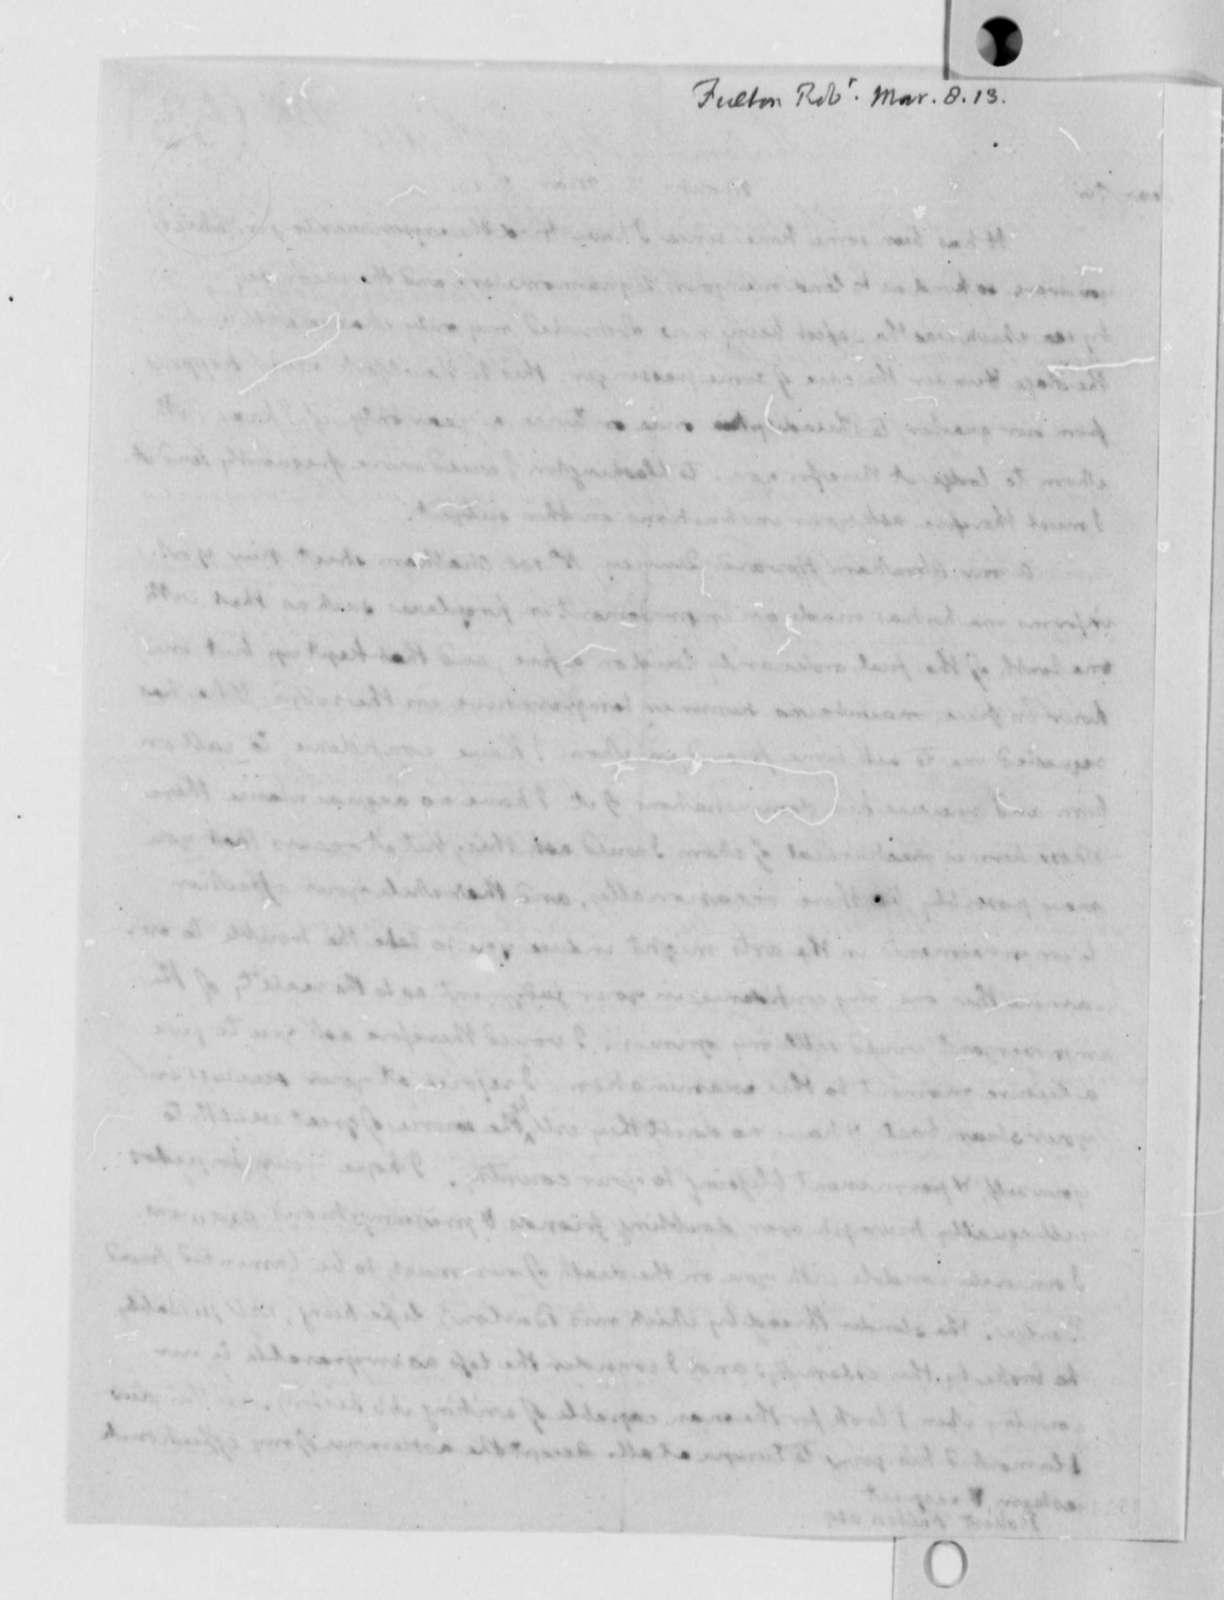 Thomas Jefferson to Robert Fulton, March 8, 1813